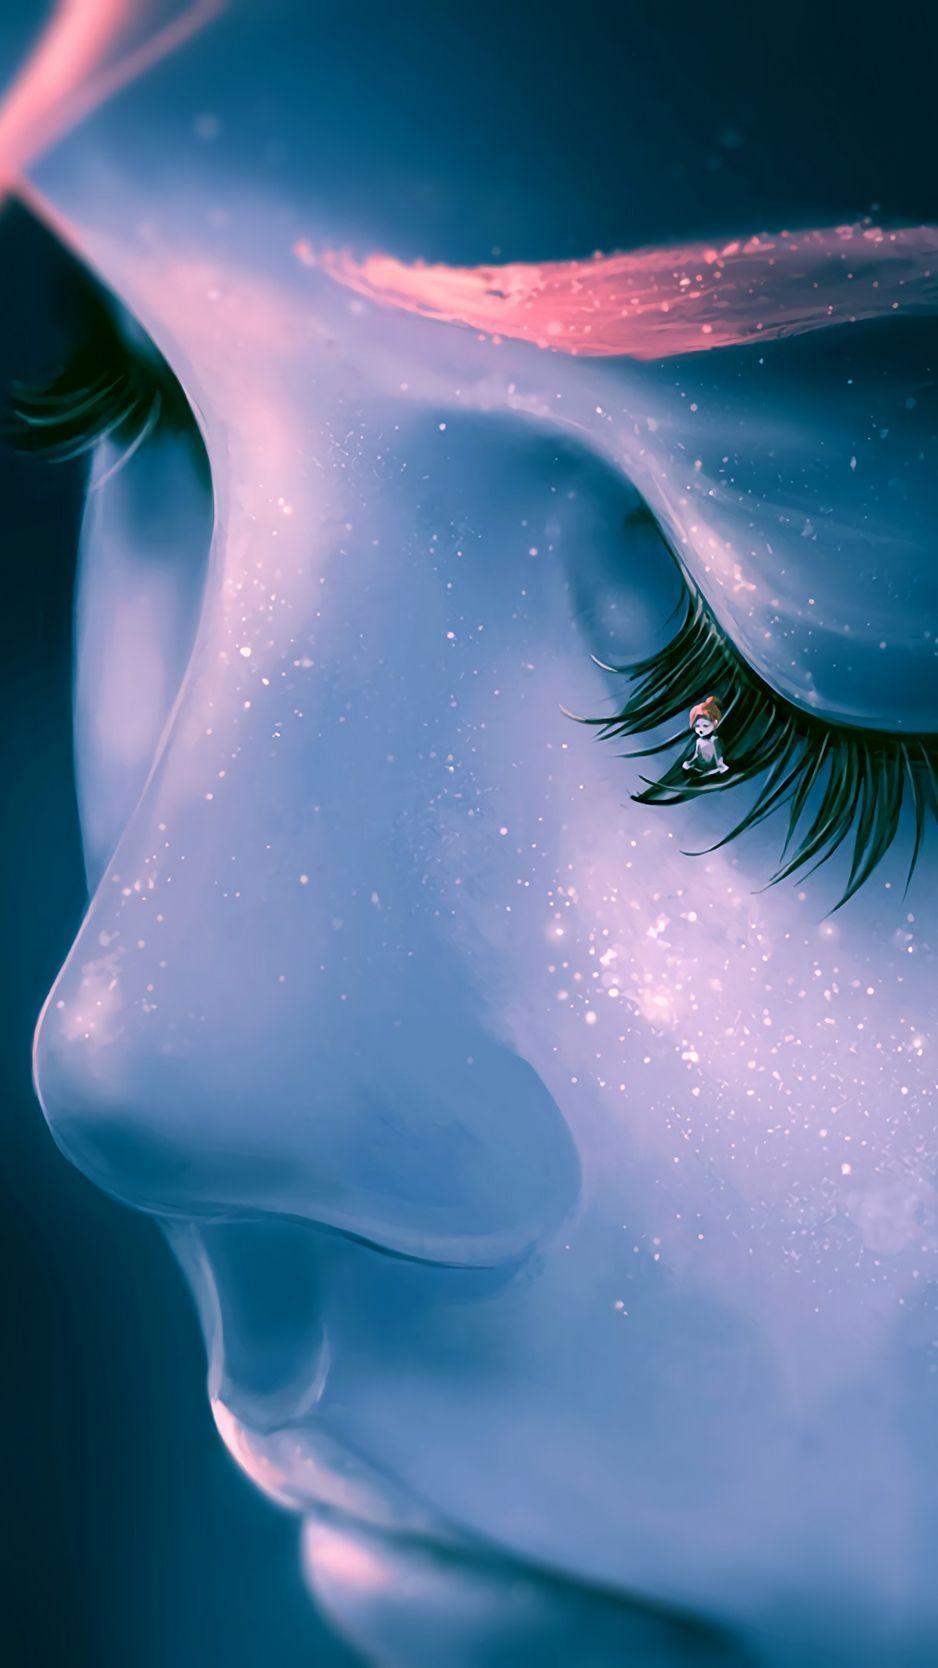 Eyes Eyelashes Sleep Dreams Background Dream Background Art Wallpaper Digital Portrait Art